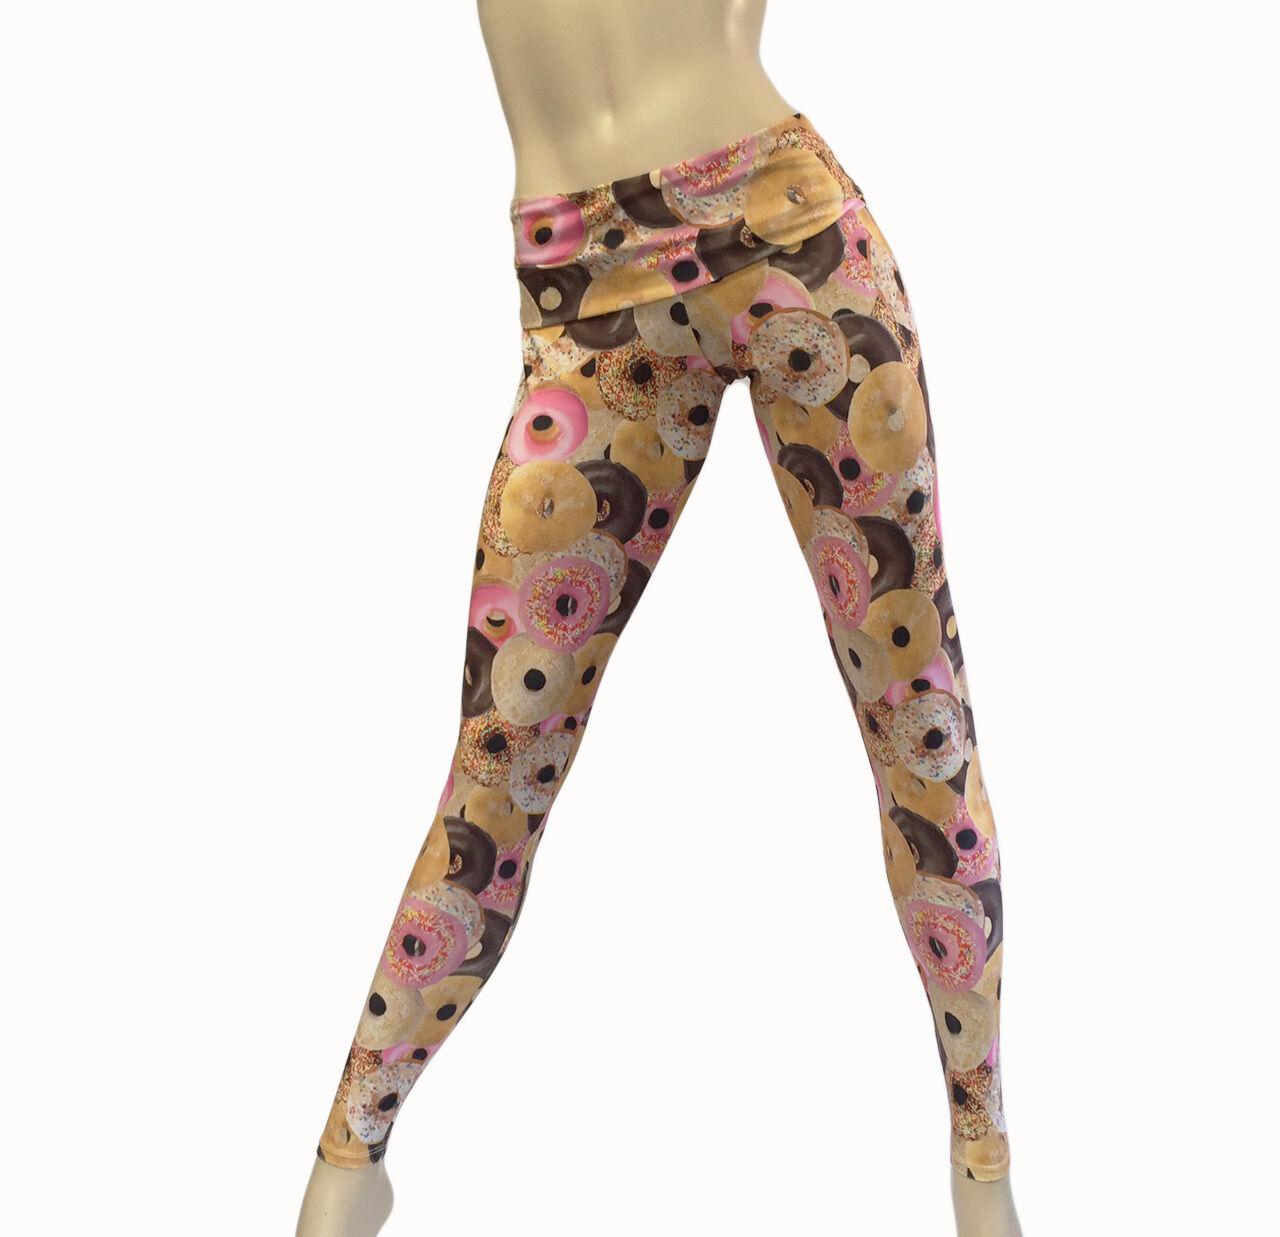 Hot Yoga Pants Donut Pants High Waist Pant Fold Over Legging SXYFITNESS